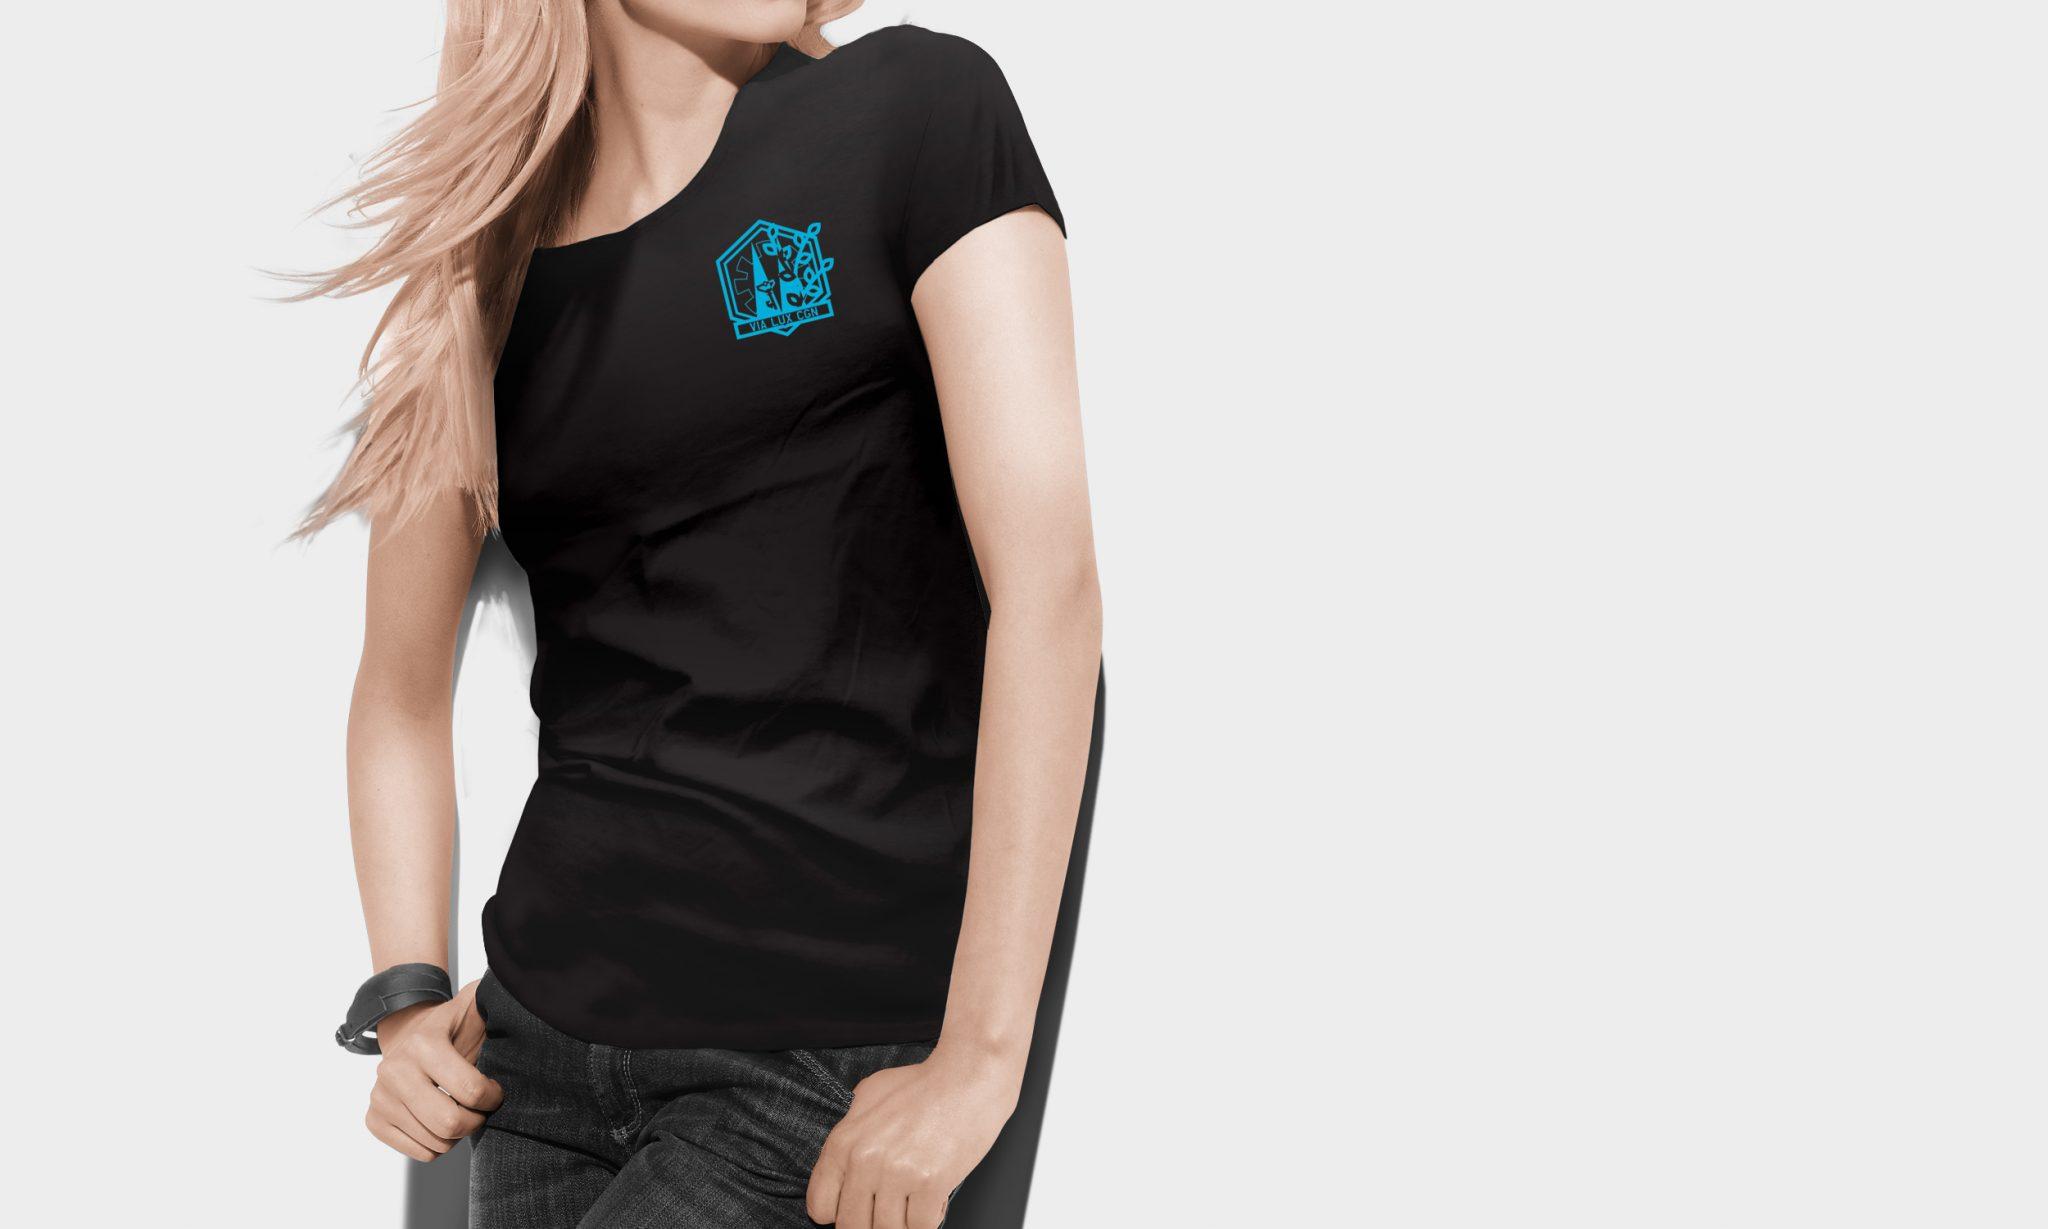 girl_shirt_front